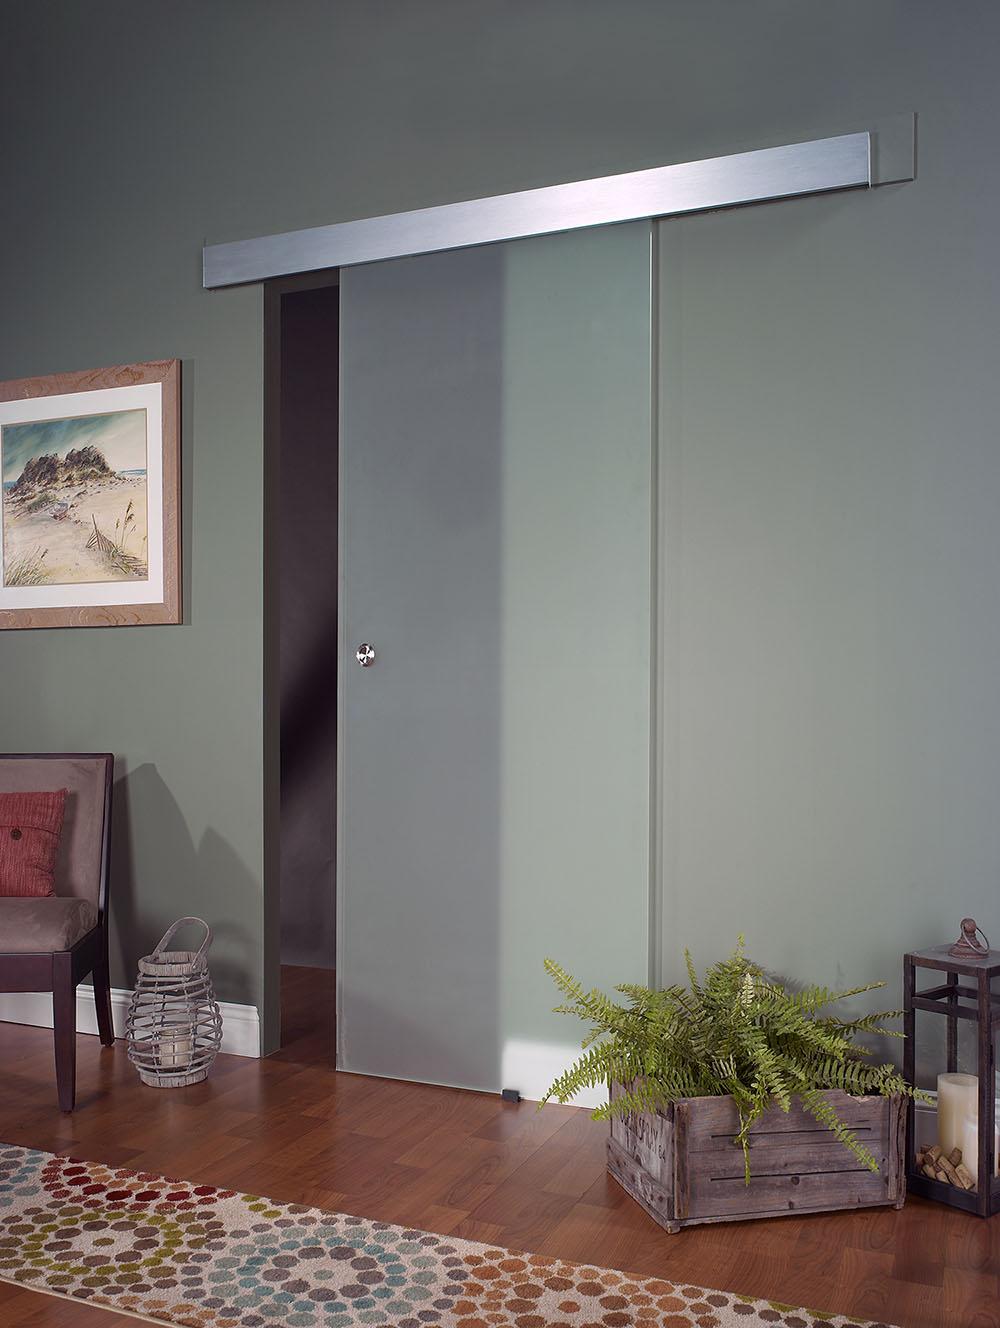 80_inch_frosted_glass_barn_door_beauty 1000jpg frosted glass barn door - Frosted Glass Barn Door